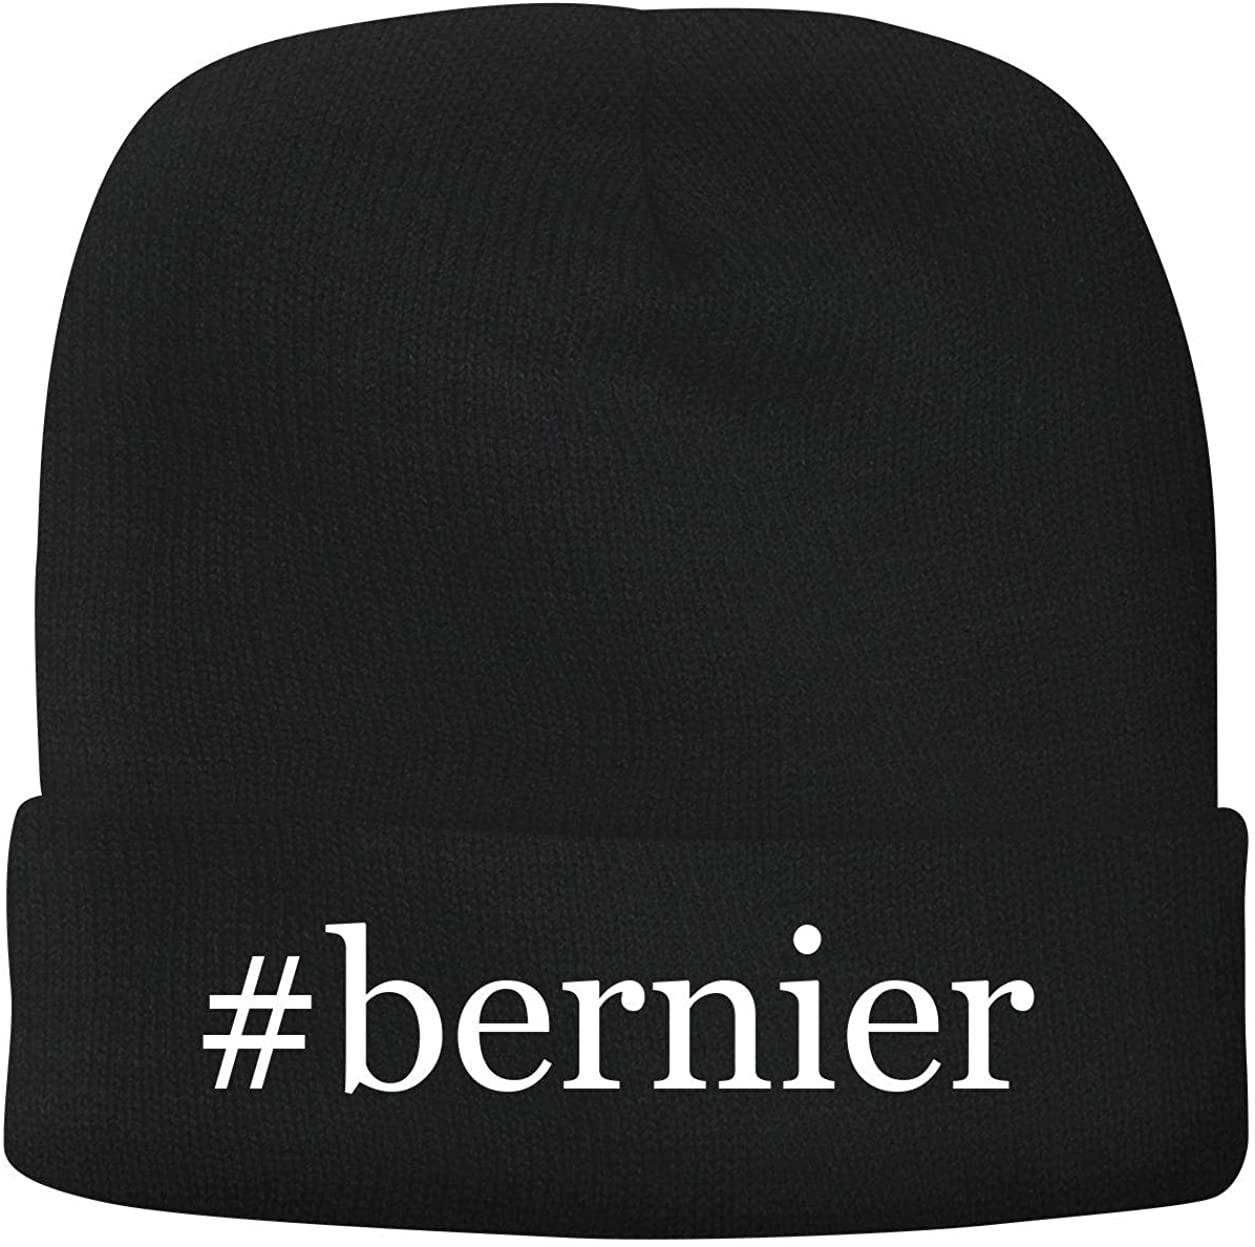 BH Cool Designs #Bernier - Men's Hashtag Soft & Comfortable Beanie Hat Cap